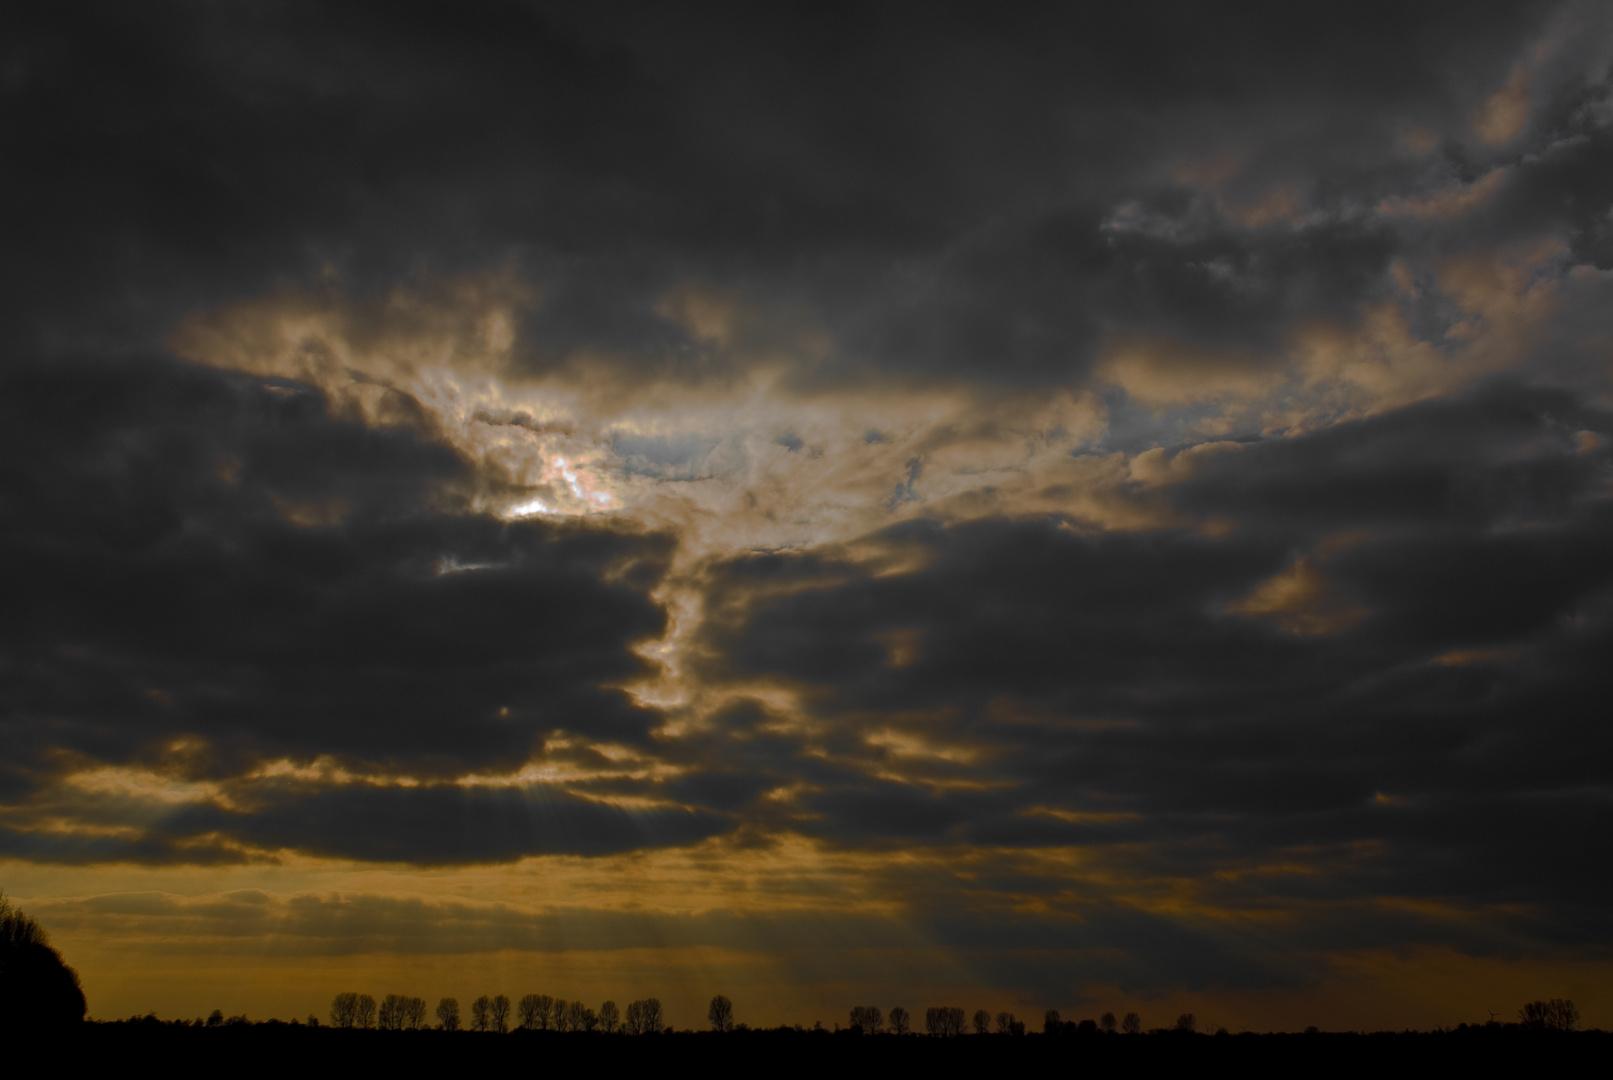 Dunkle Wolken droh´n